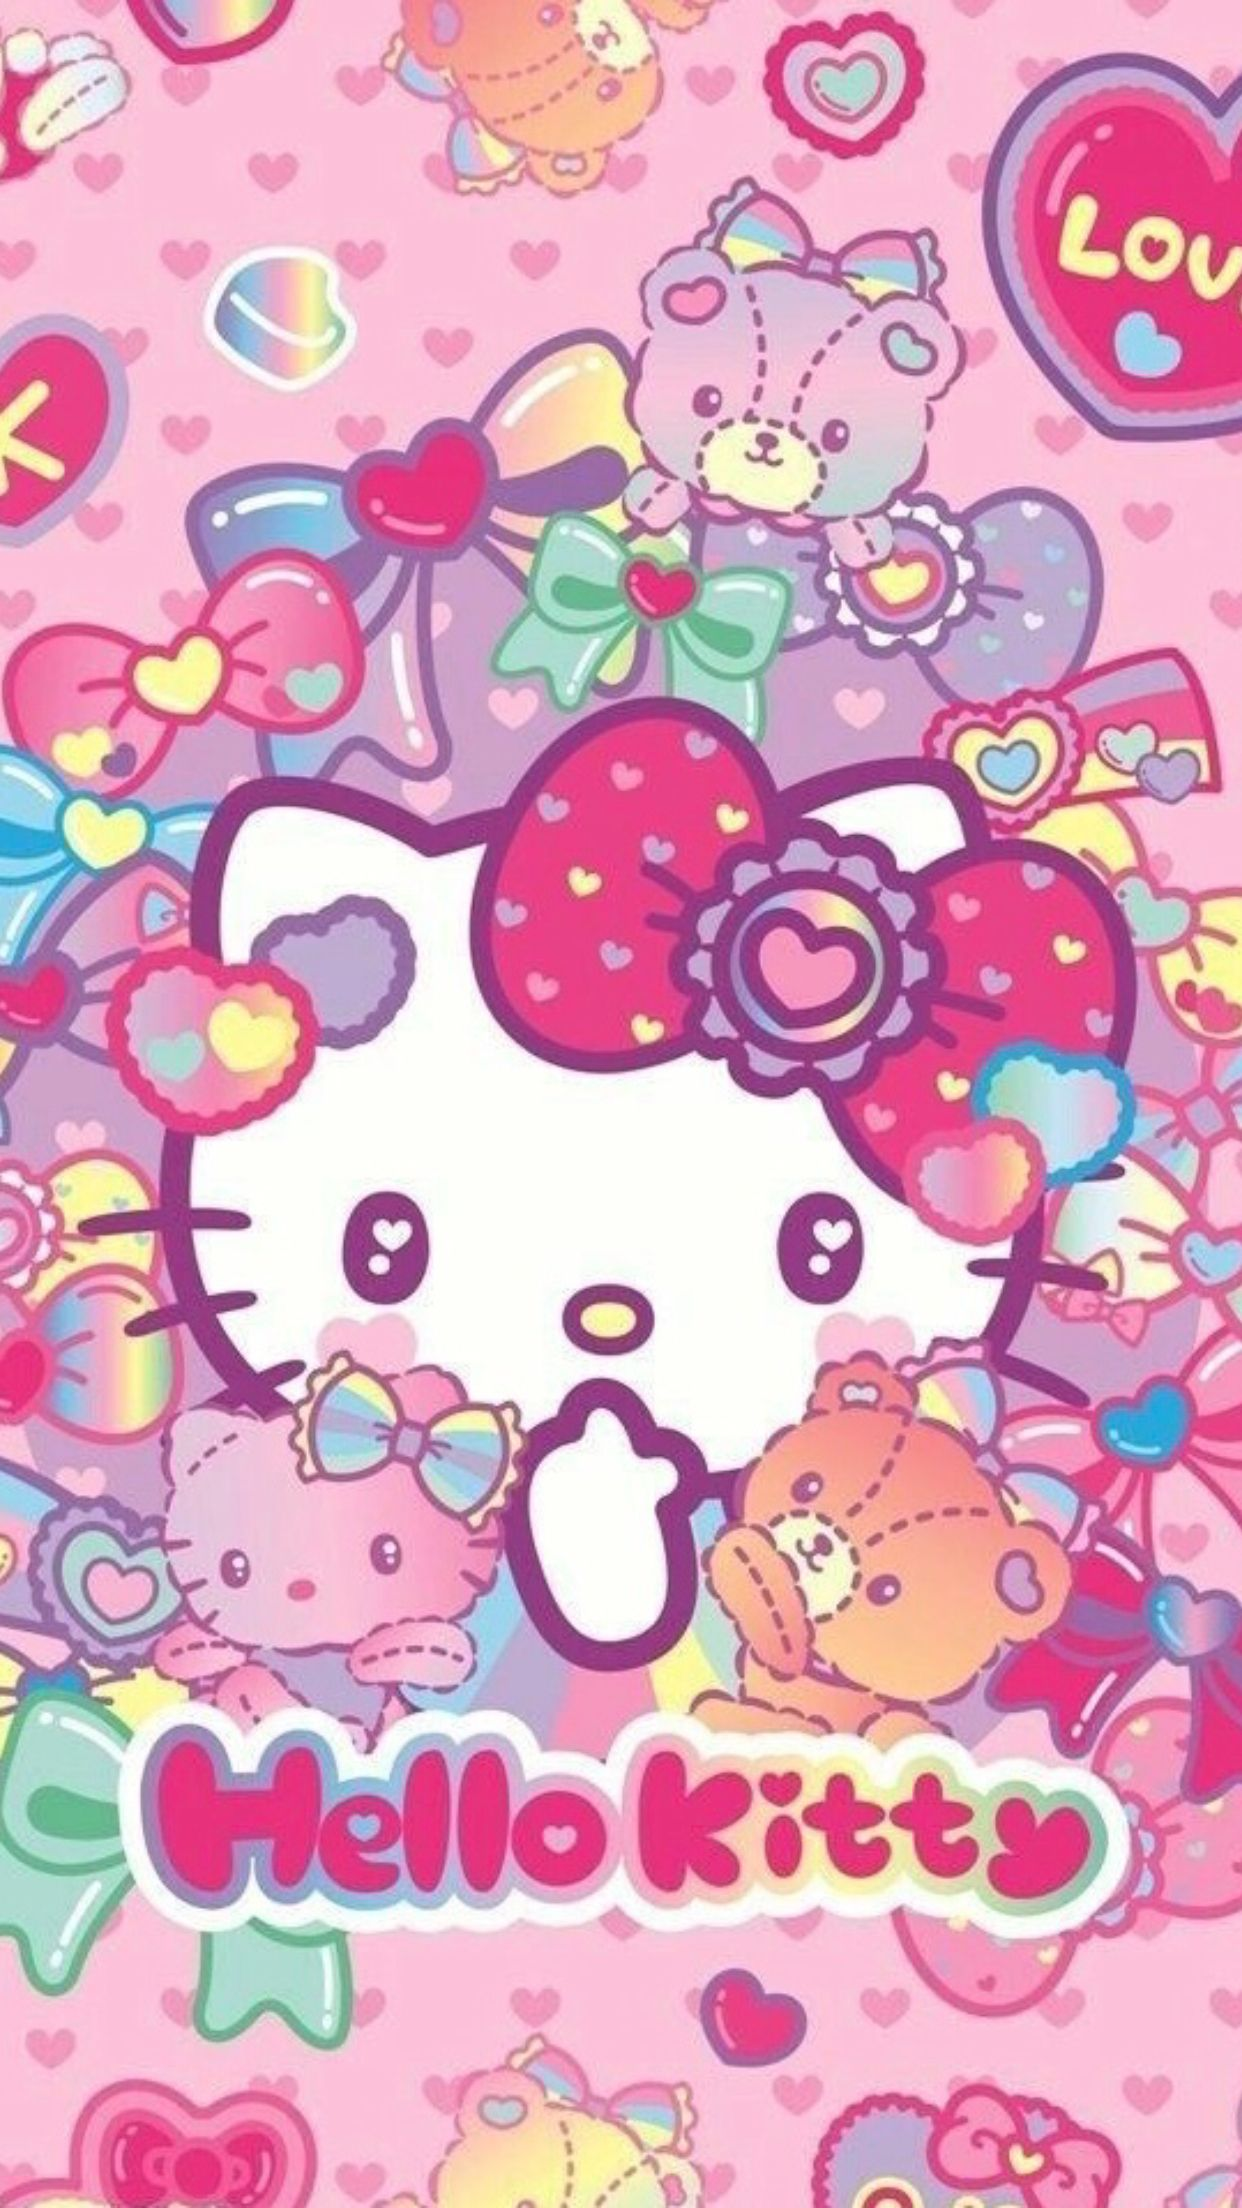 Hello Kitty Wallpaper Hello Kitty Backgrounds Hello Kitty Images Hello Kitty Pictures